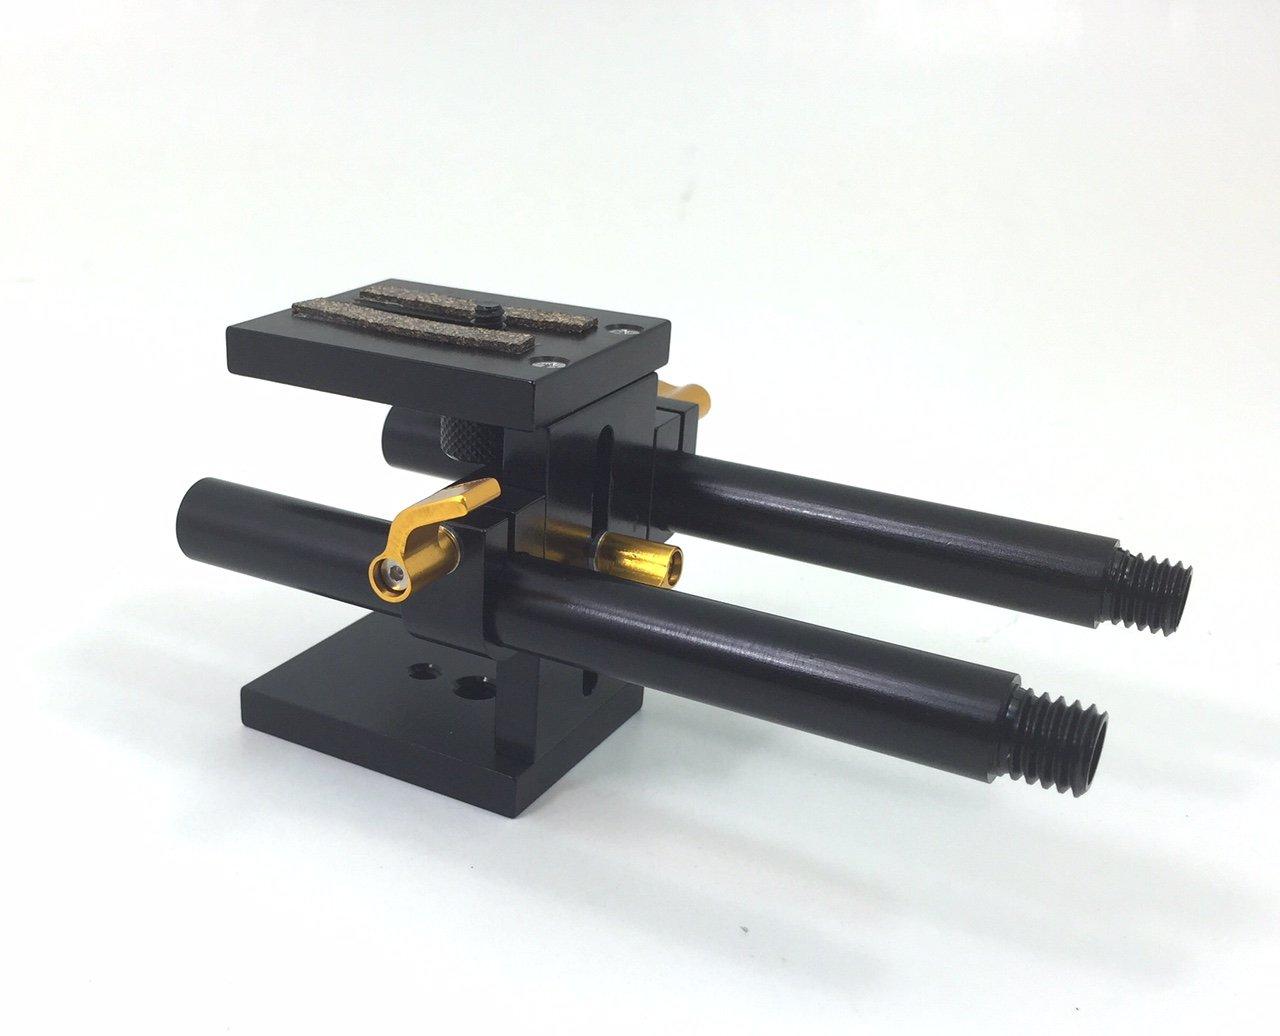 RR 100# Glide Gear 15mm Rail Rod Support System Baseplate Mount DSLR Follow Focus by Glide Gear